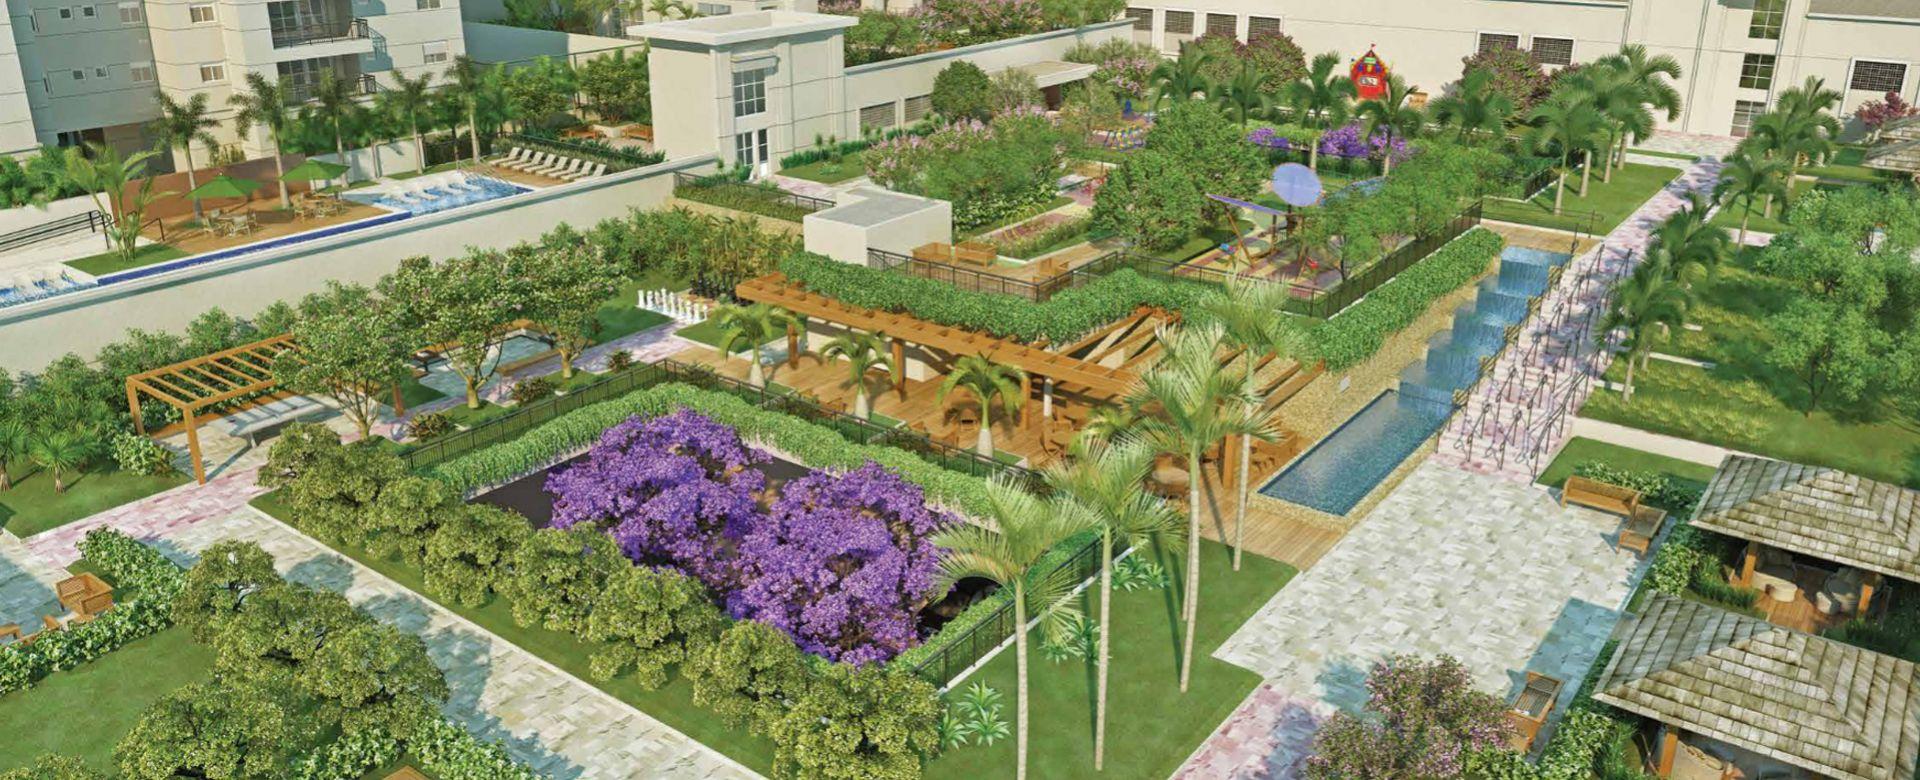 Cidade Maia Jardim, foto 1